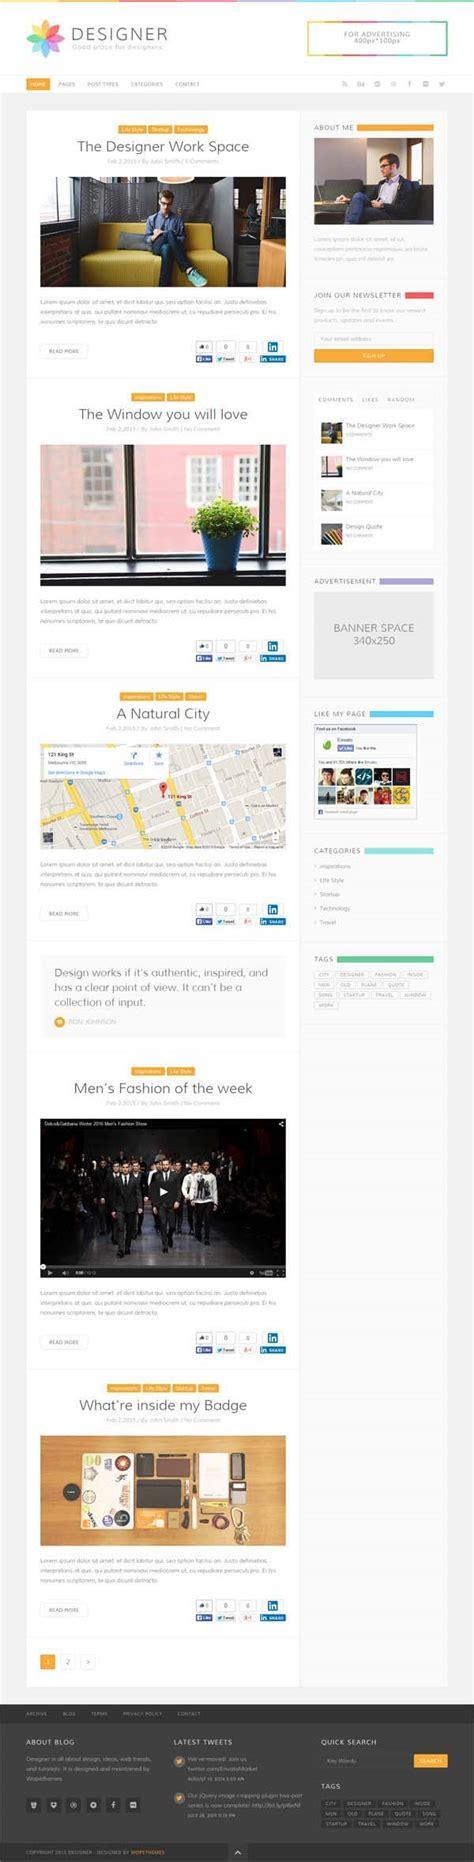 wordpress themes grafik design new responsive wordpress themes with html5 ui wordpress